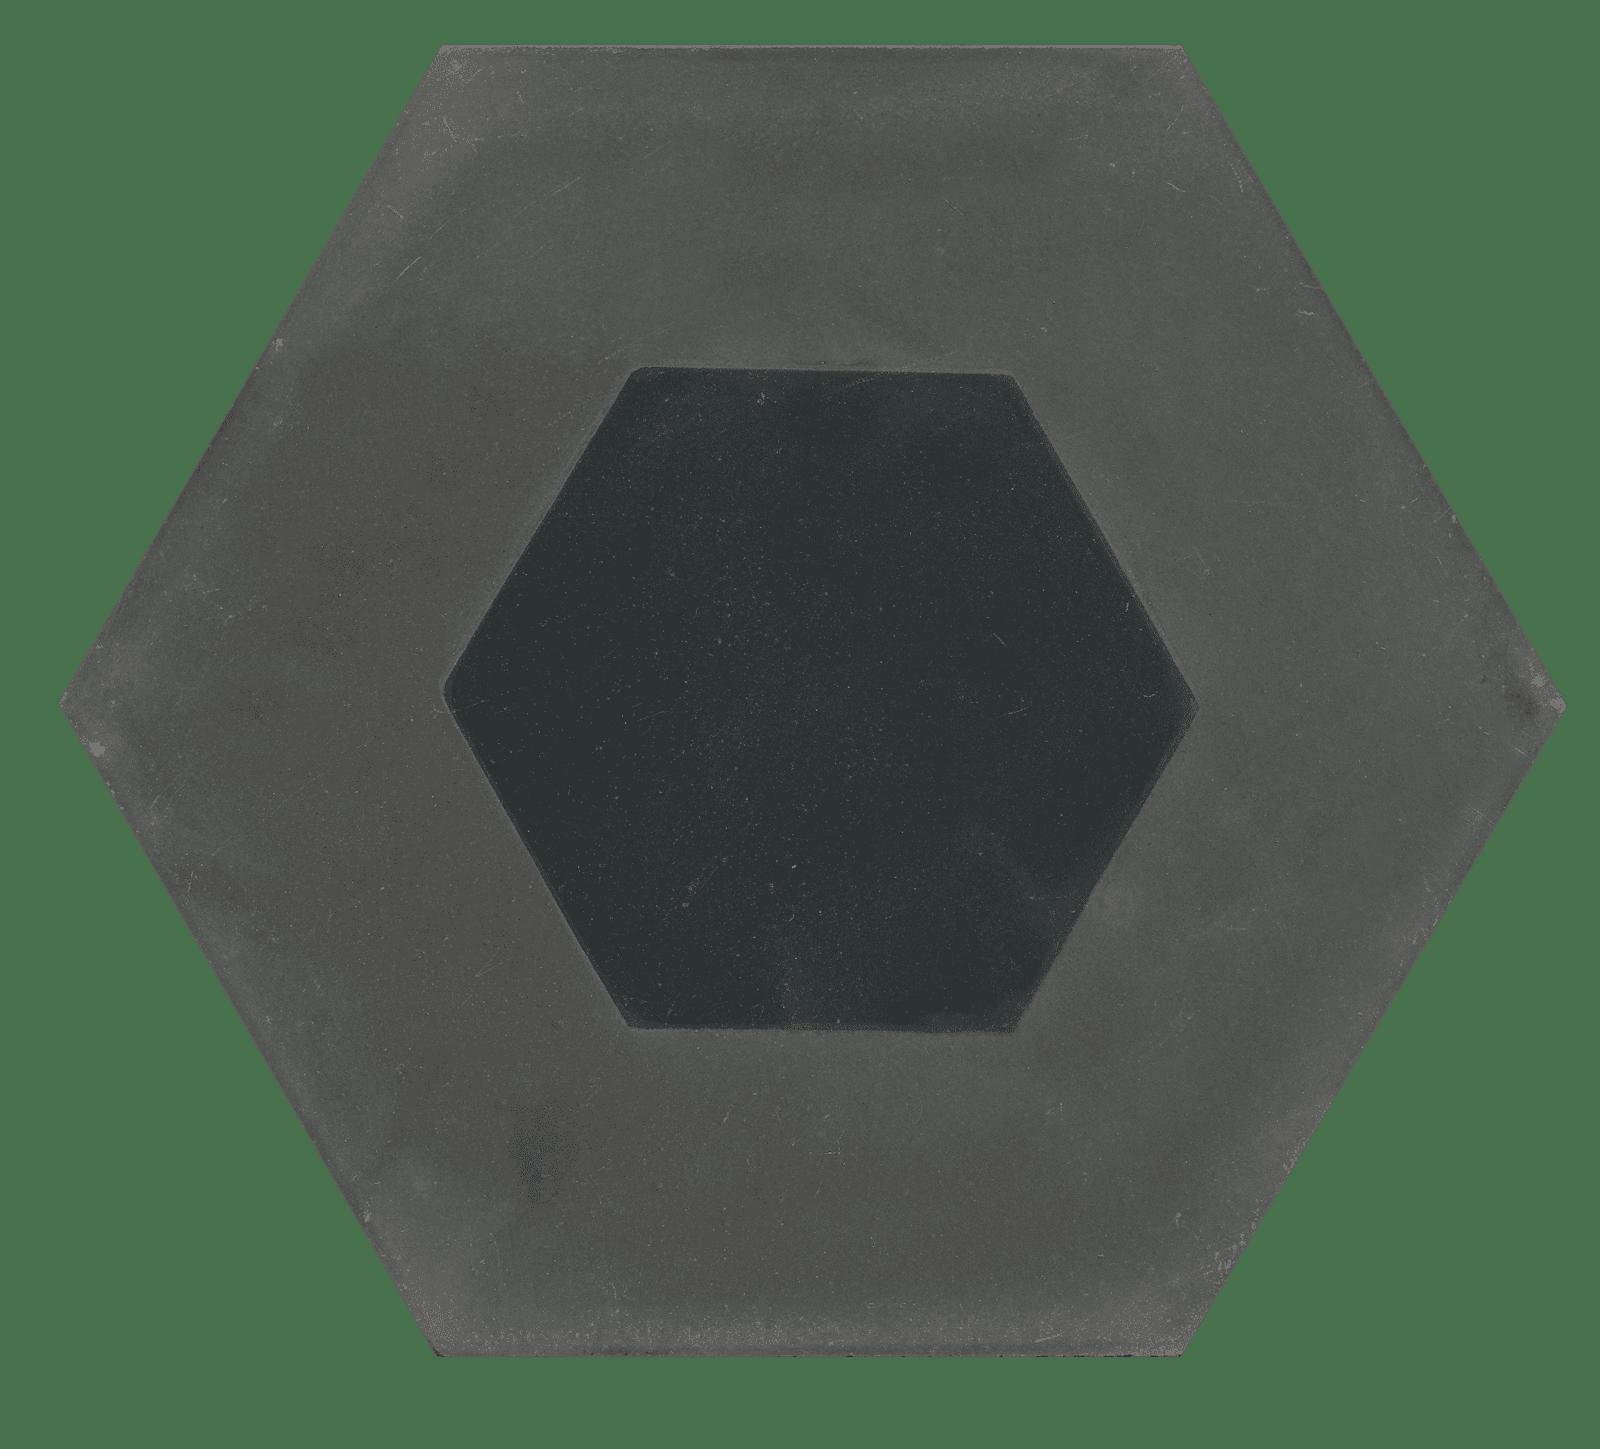 zementmosaikplatte-nummer-600561-via-gmbh | 600561